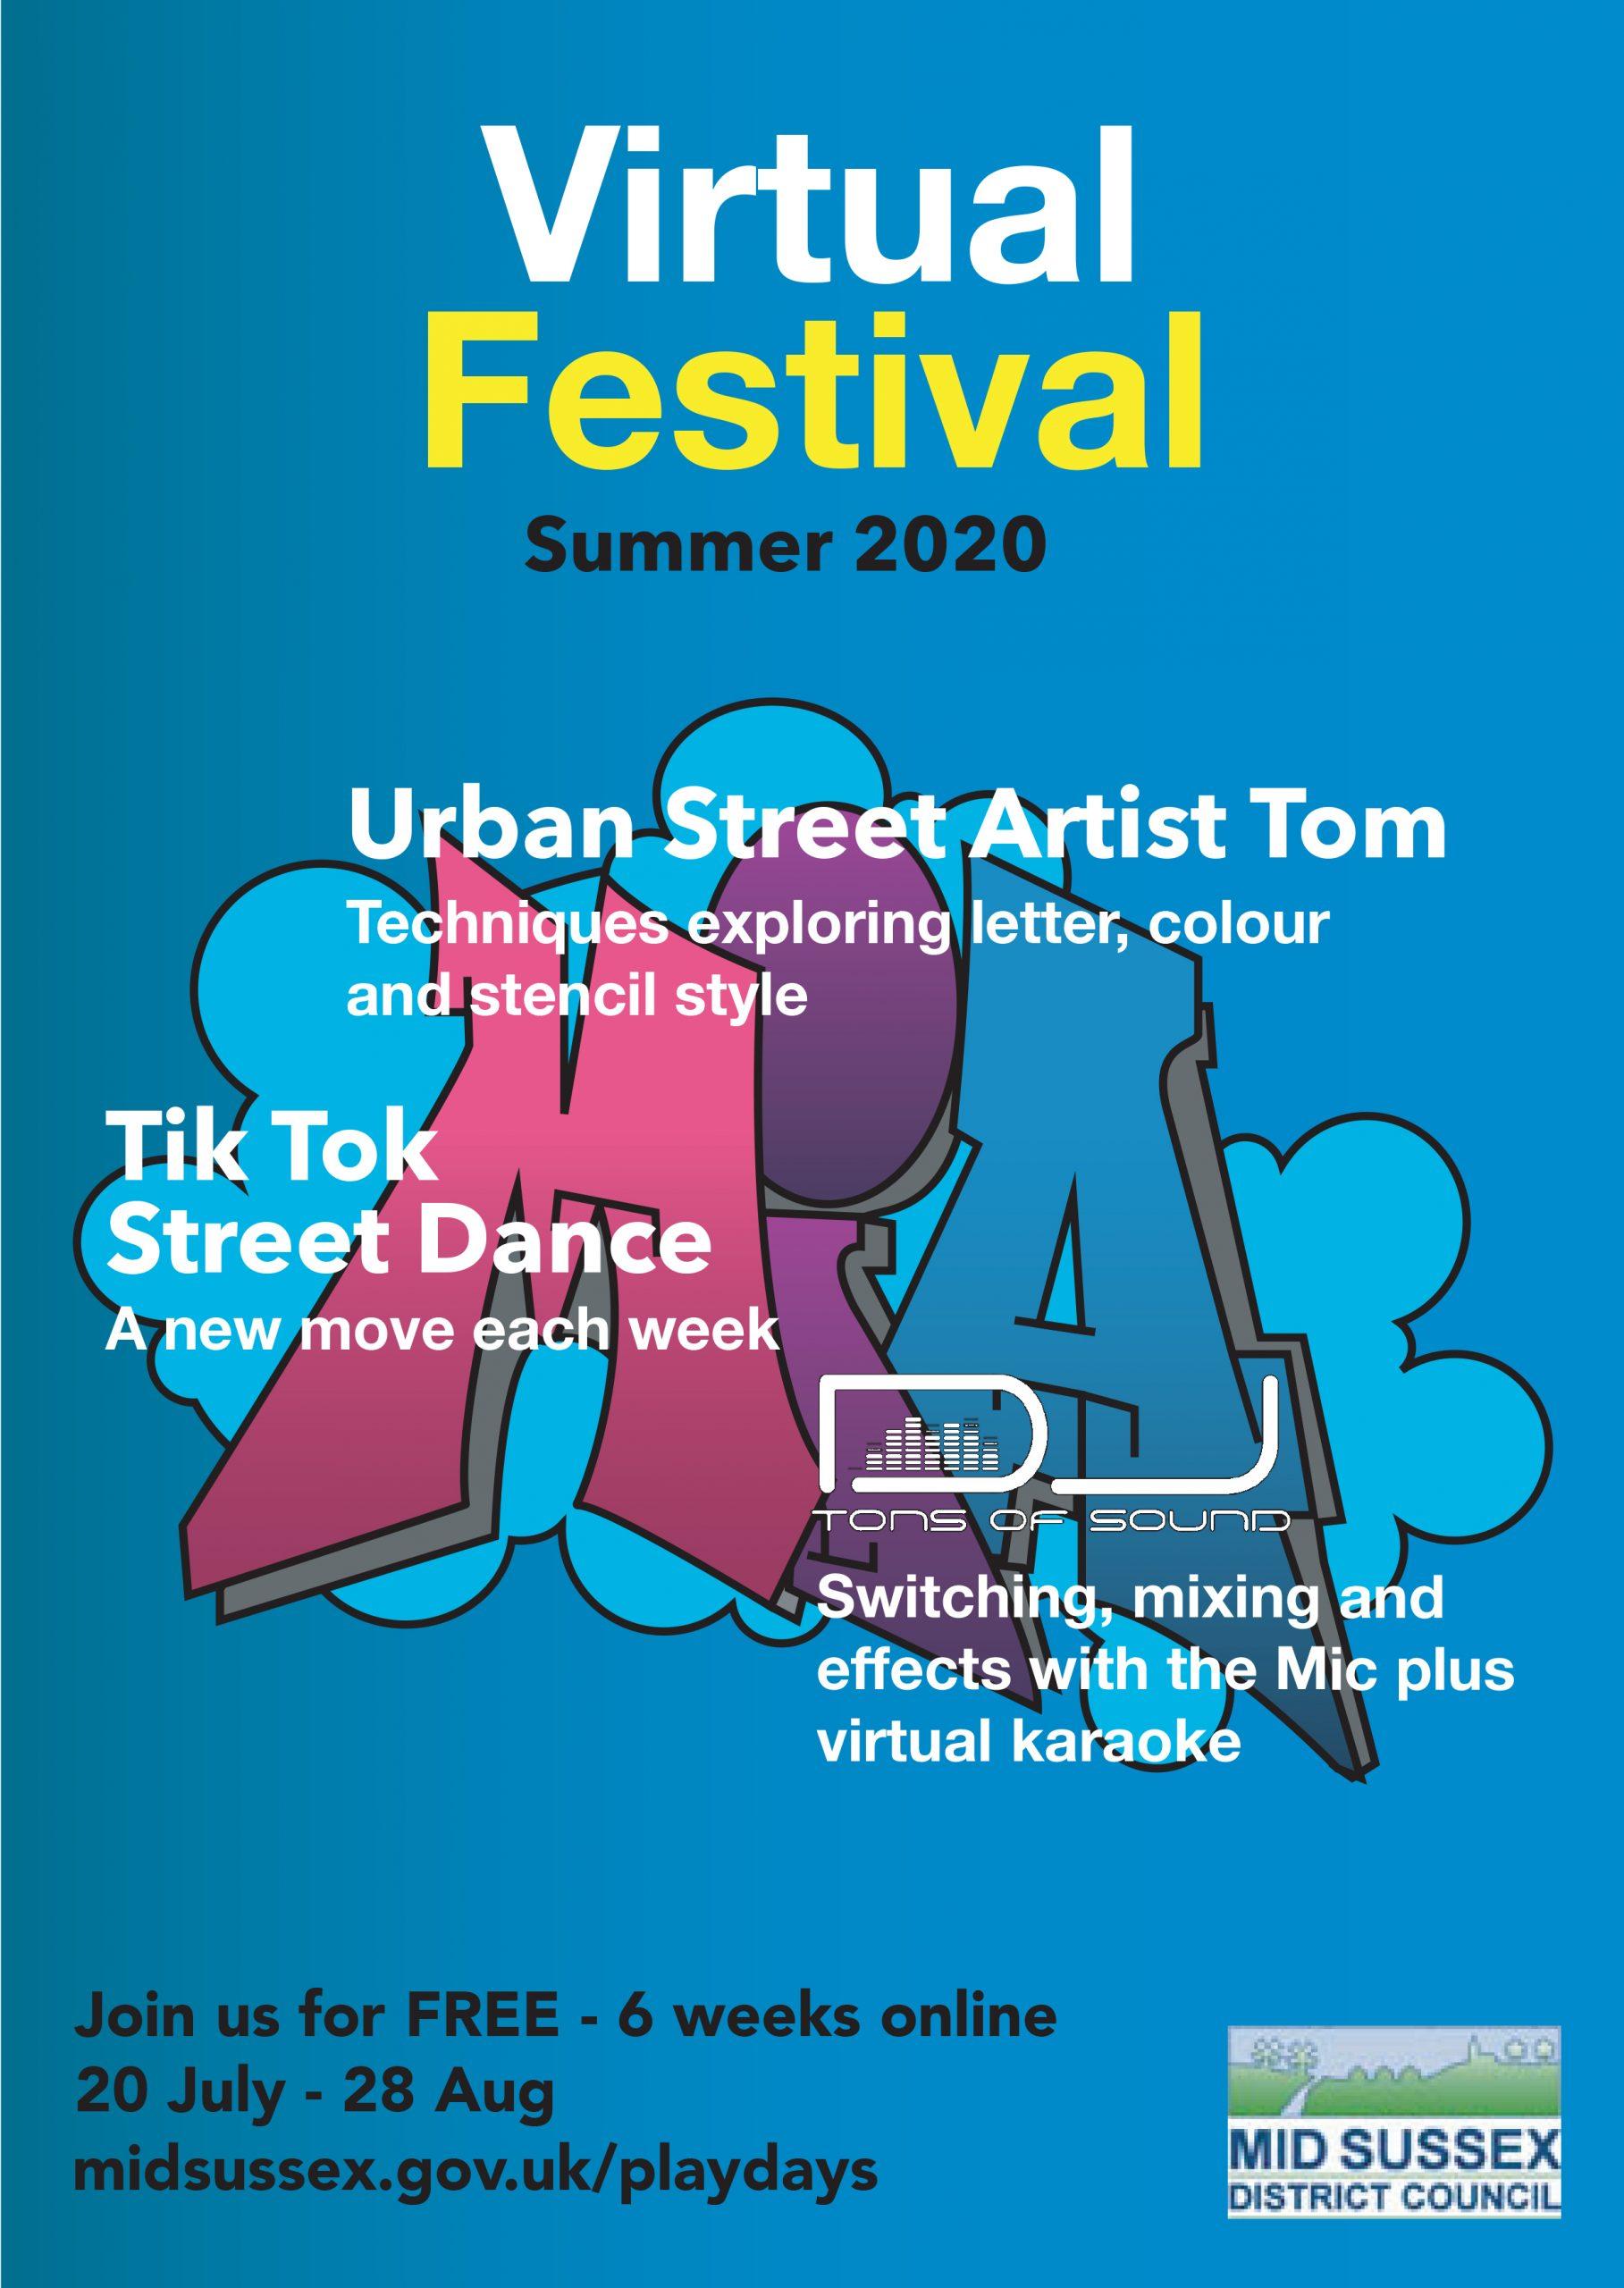 Virtual Festival Summer 2020